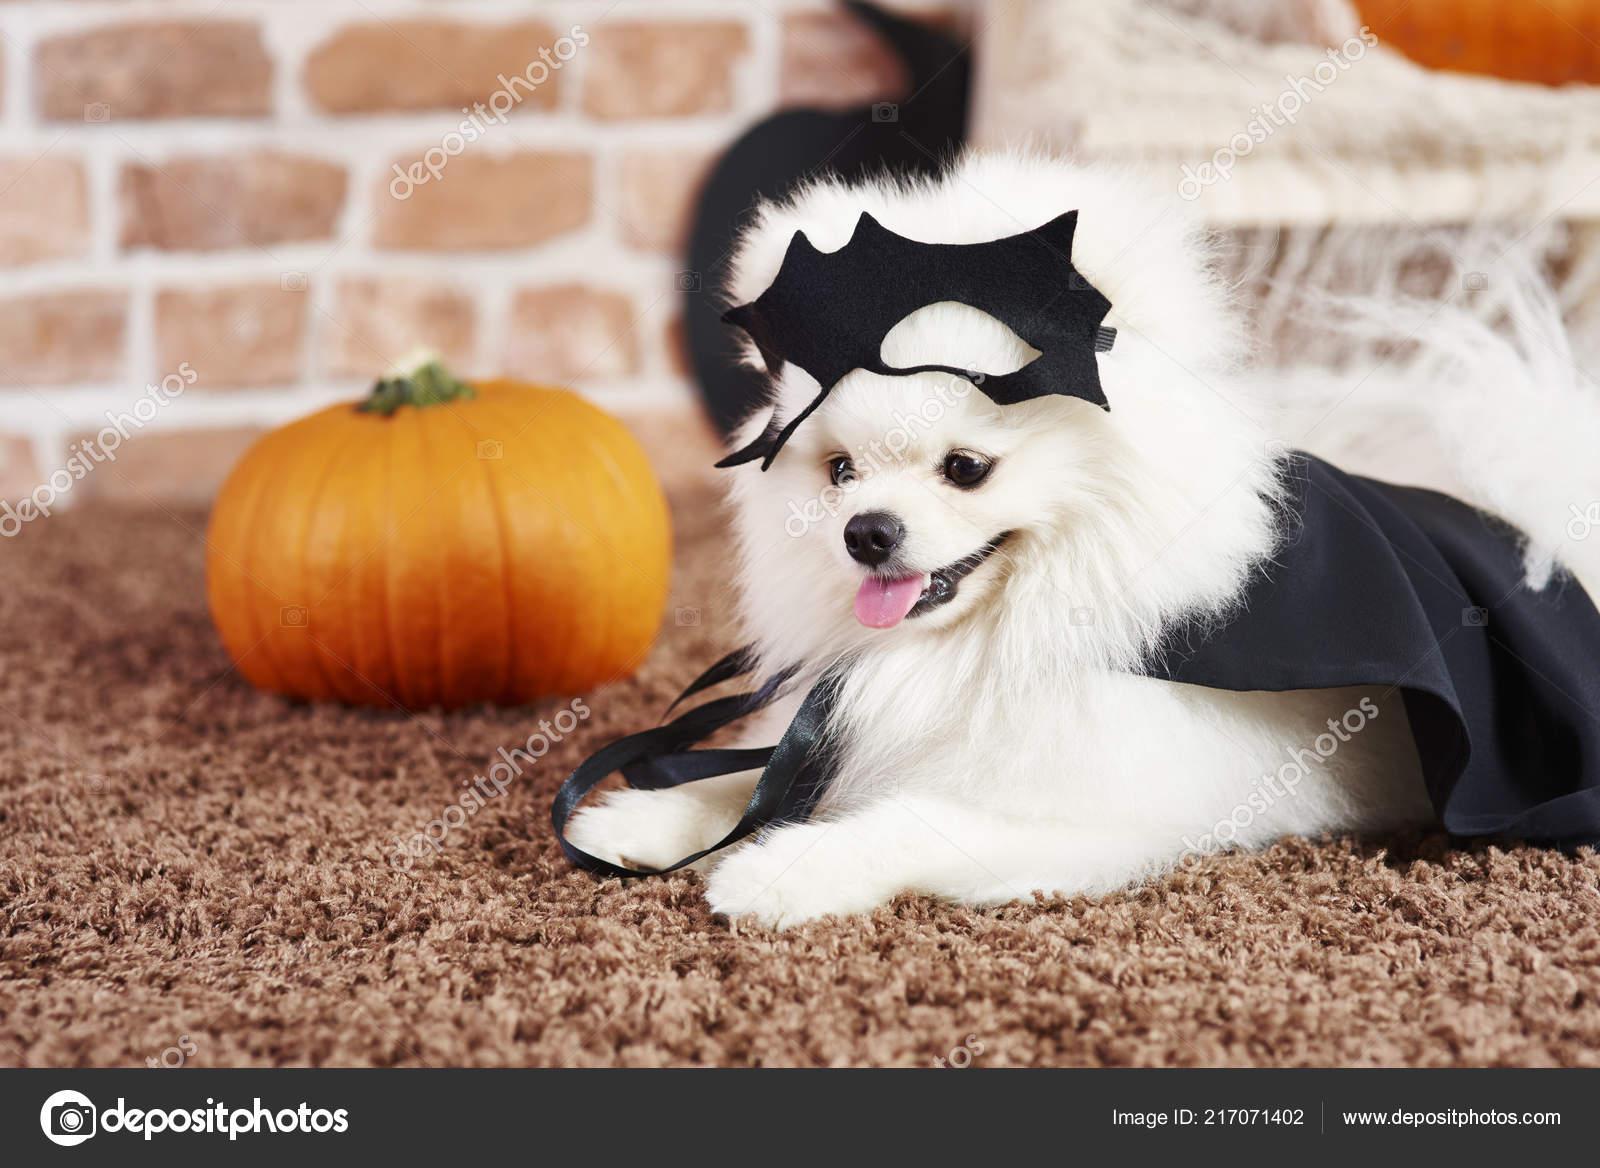 Cute Puppy Halloween Costume Stock Photo Gpointstudio 217071402